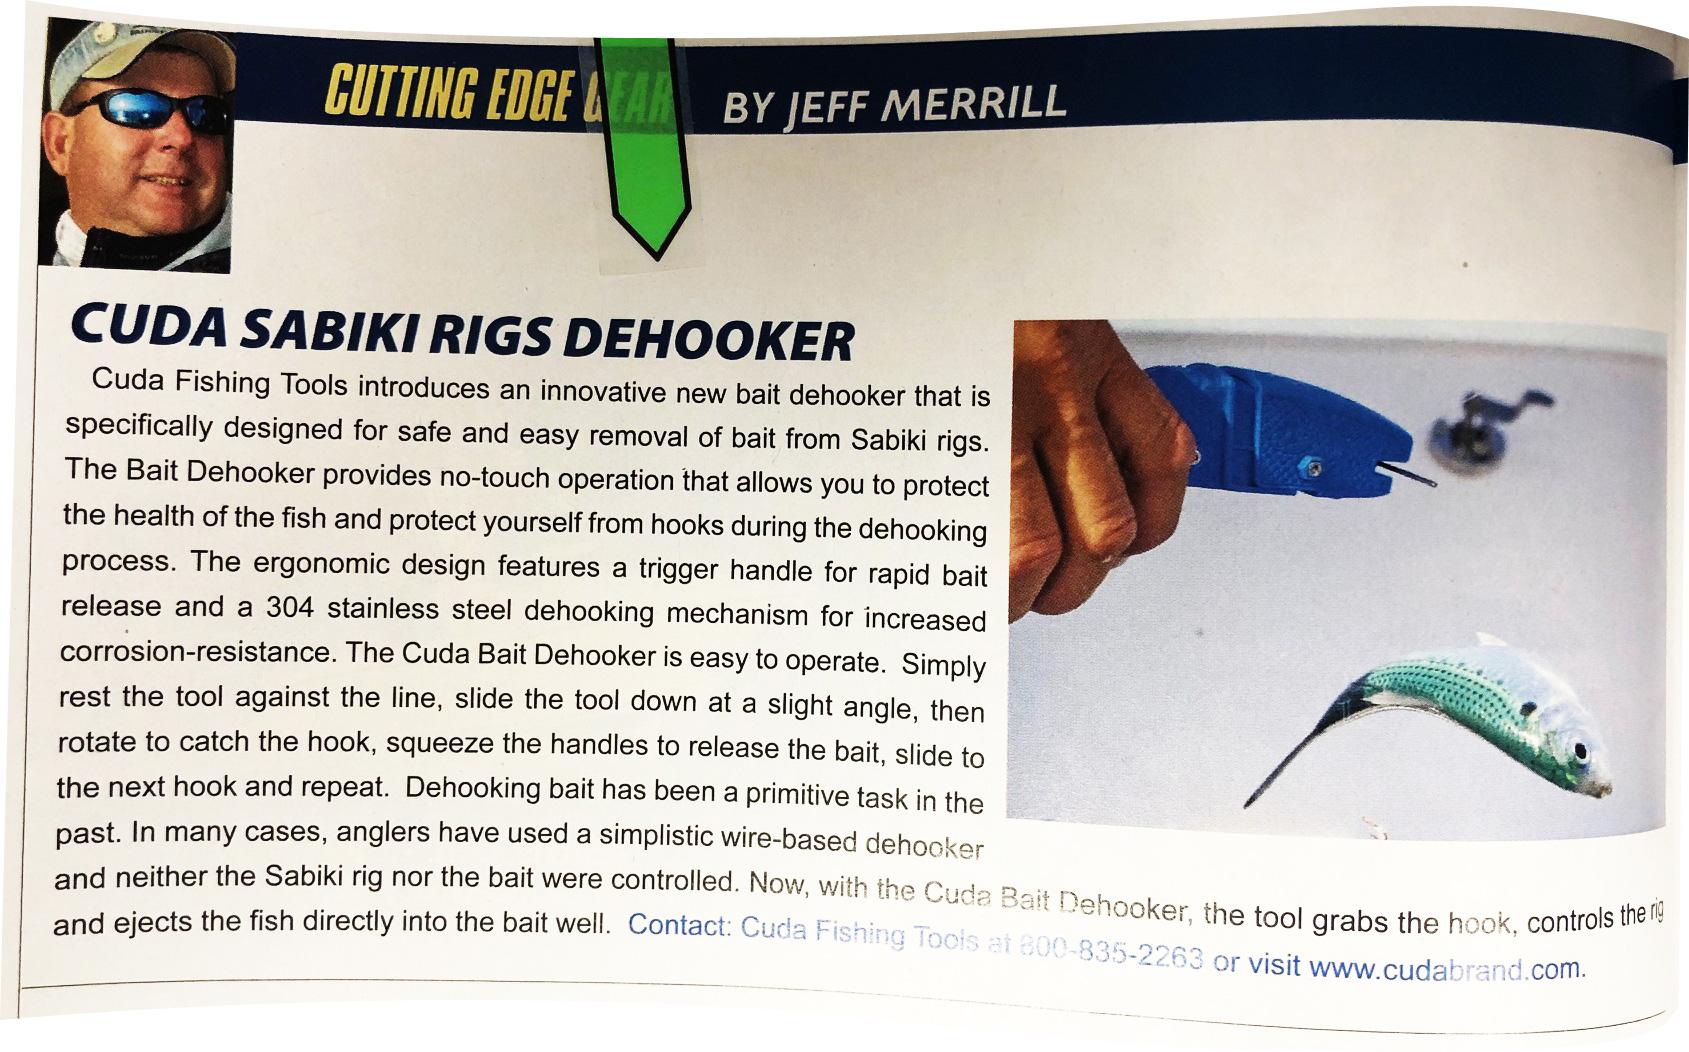 Cutting Edge Gear